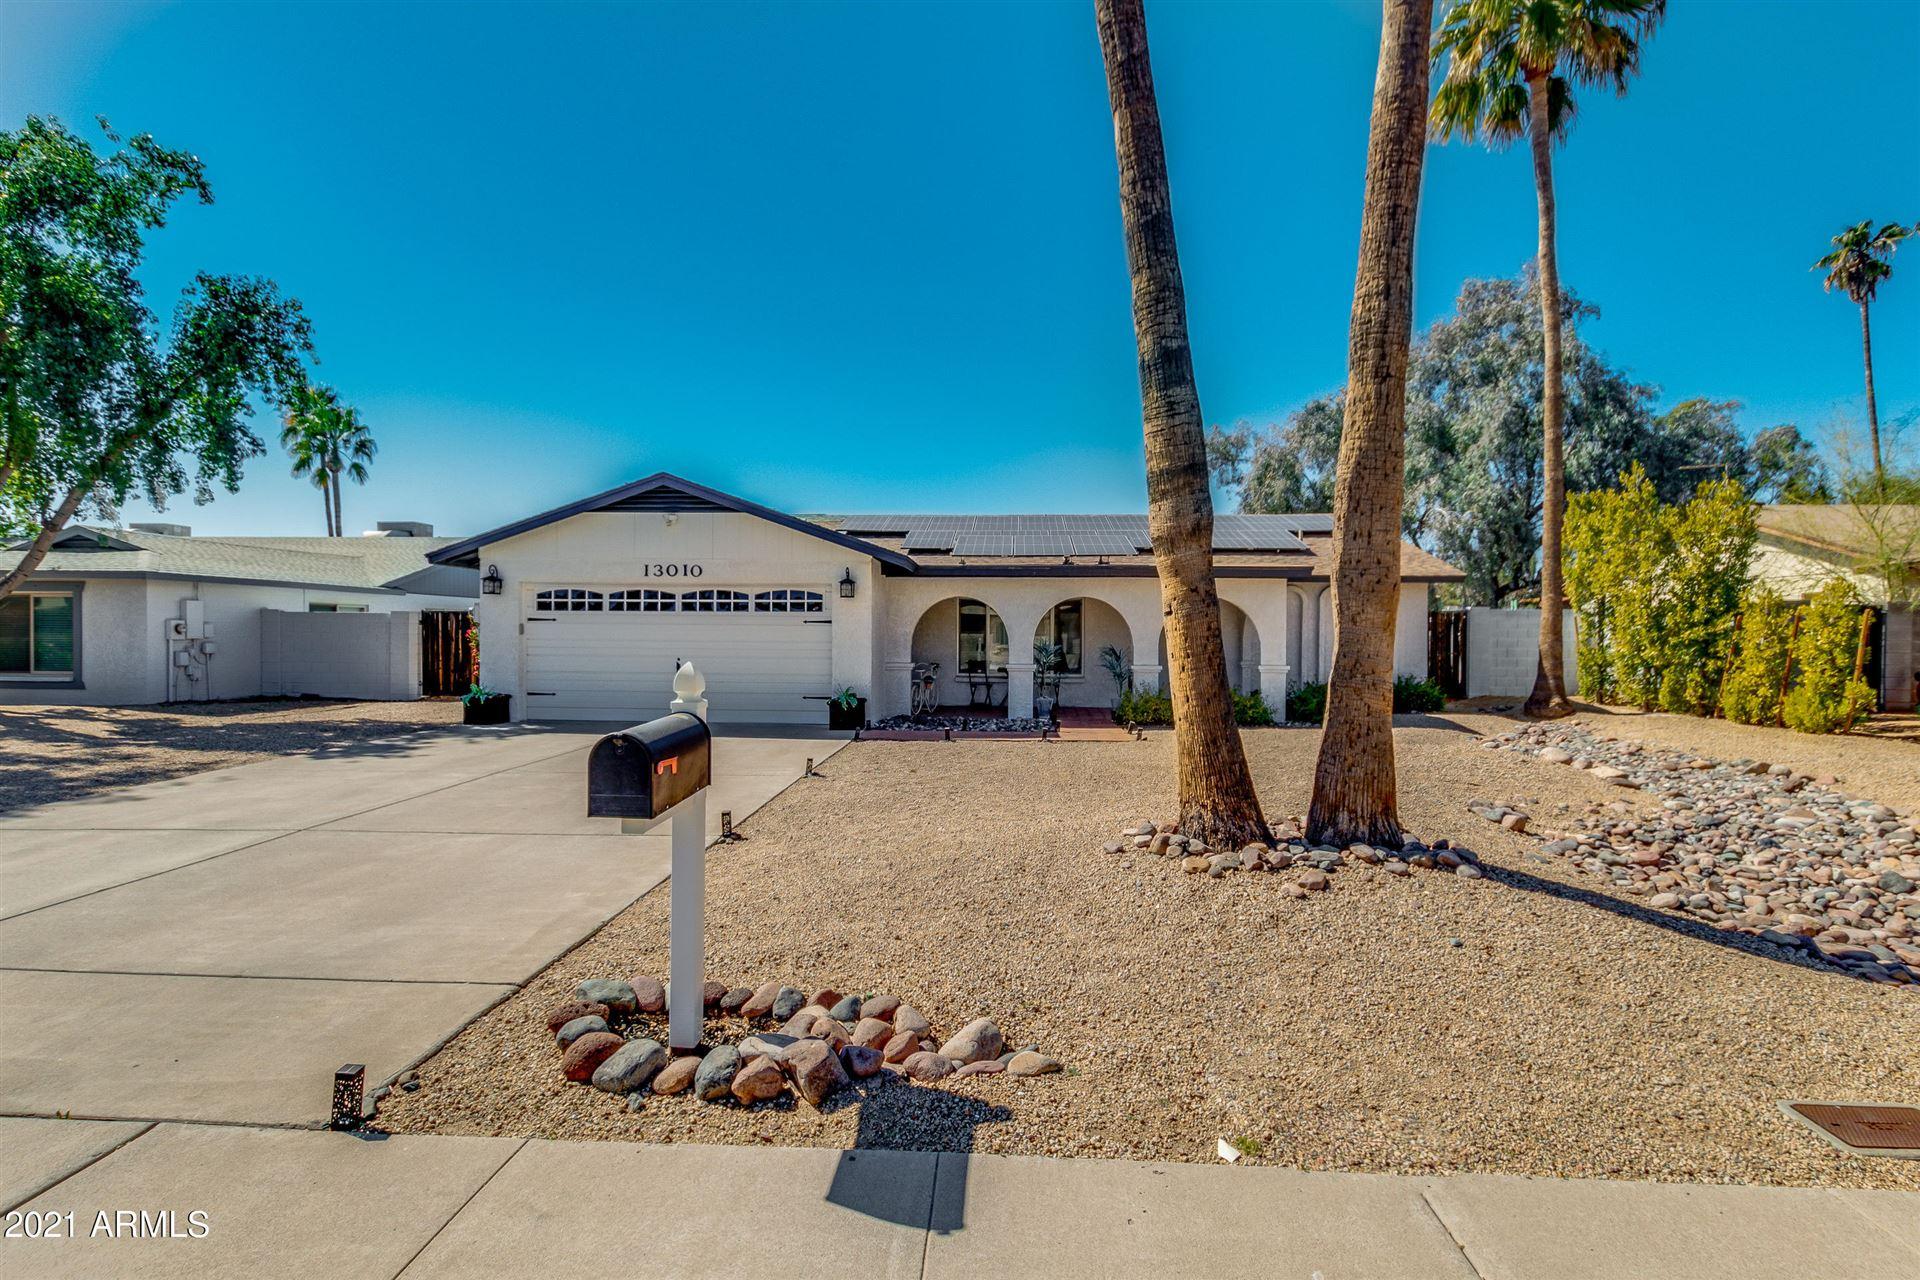 Photo of 13010 N 49TH Place, Scottsdale, AZ 85254 (MLS # 6201174)